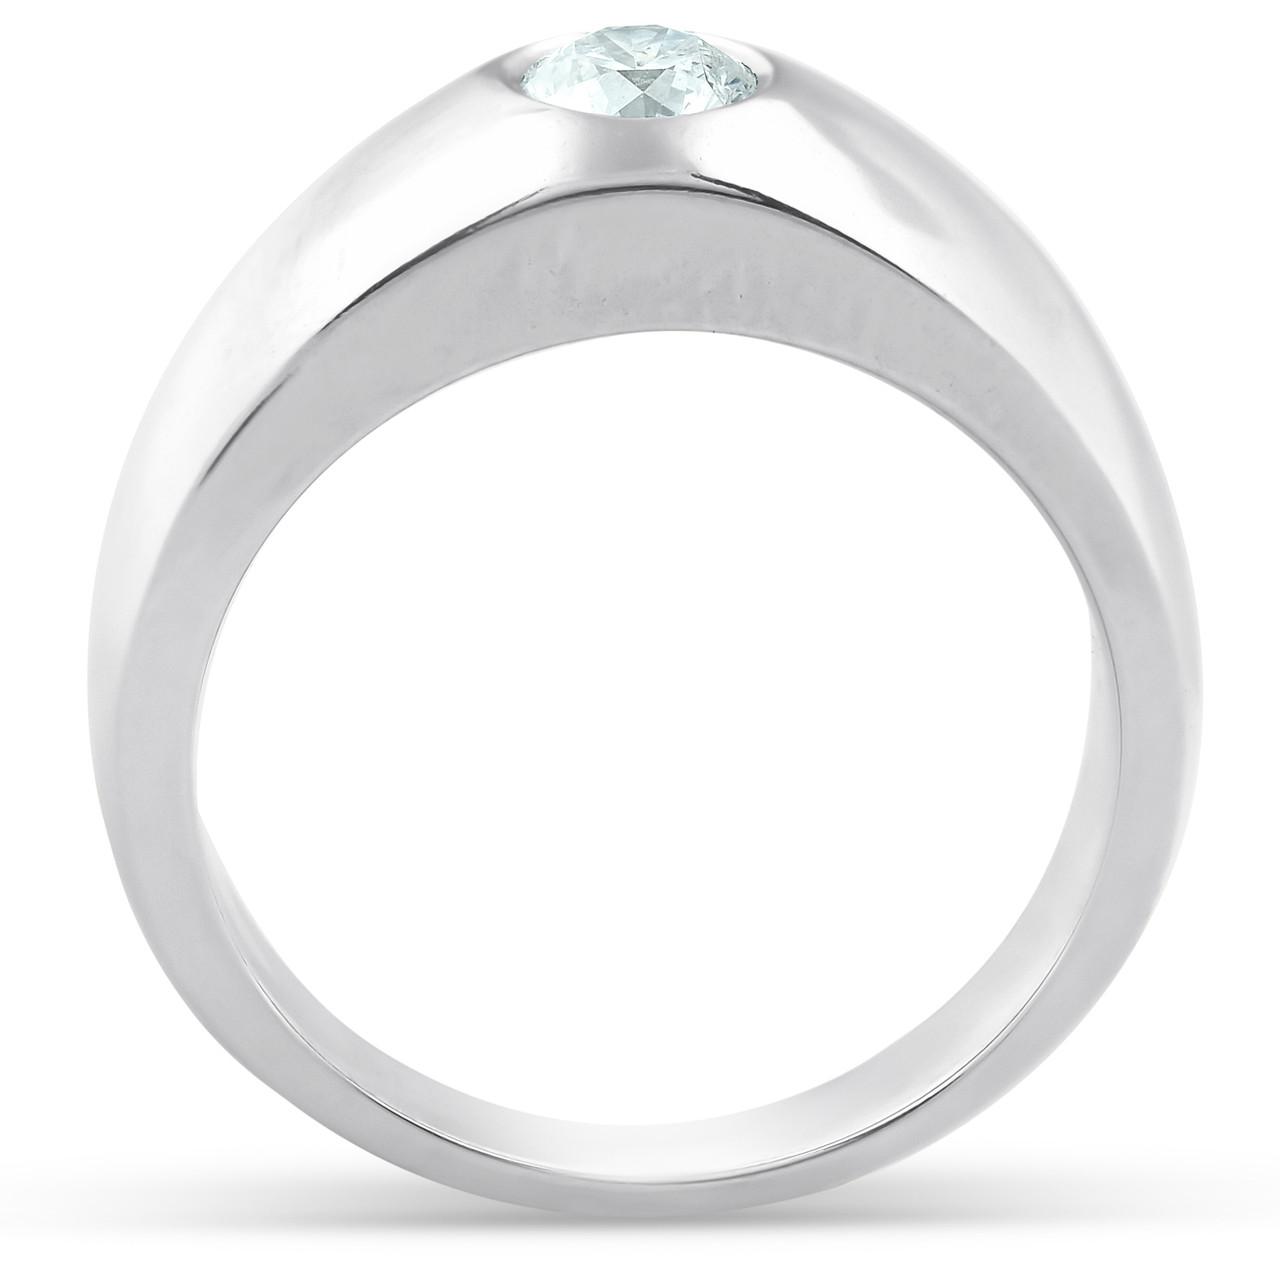 bc6fc4d90d2cf Mens 14k White Gold 1/2ct Solitaire Bezel Round Diamond Wedding Anniversary  Ring (G, SI)